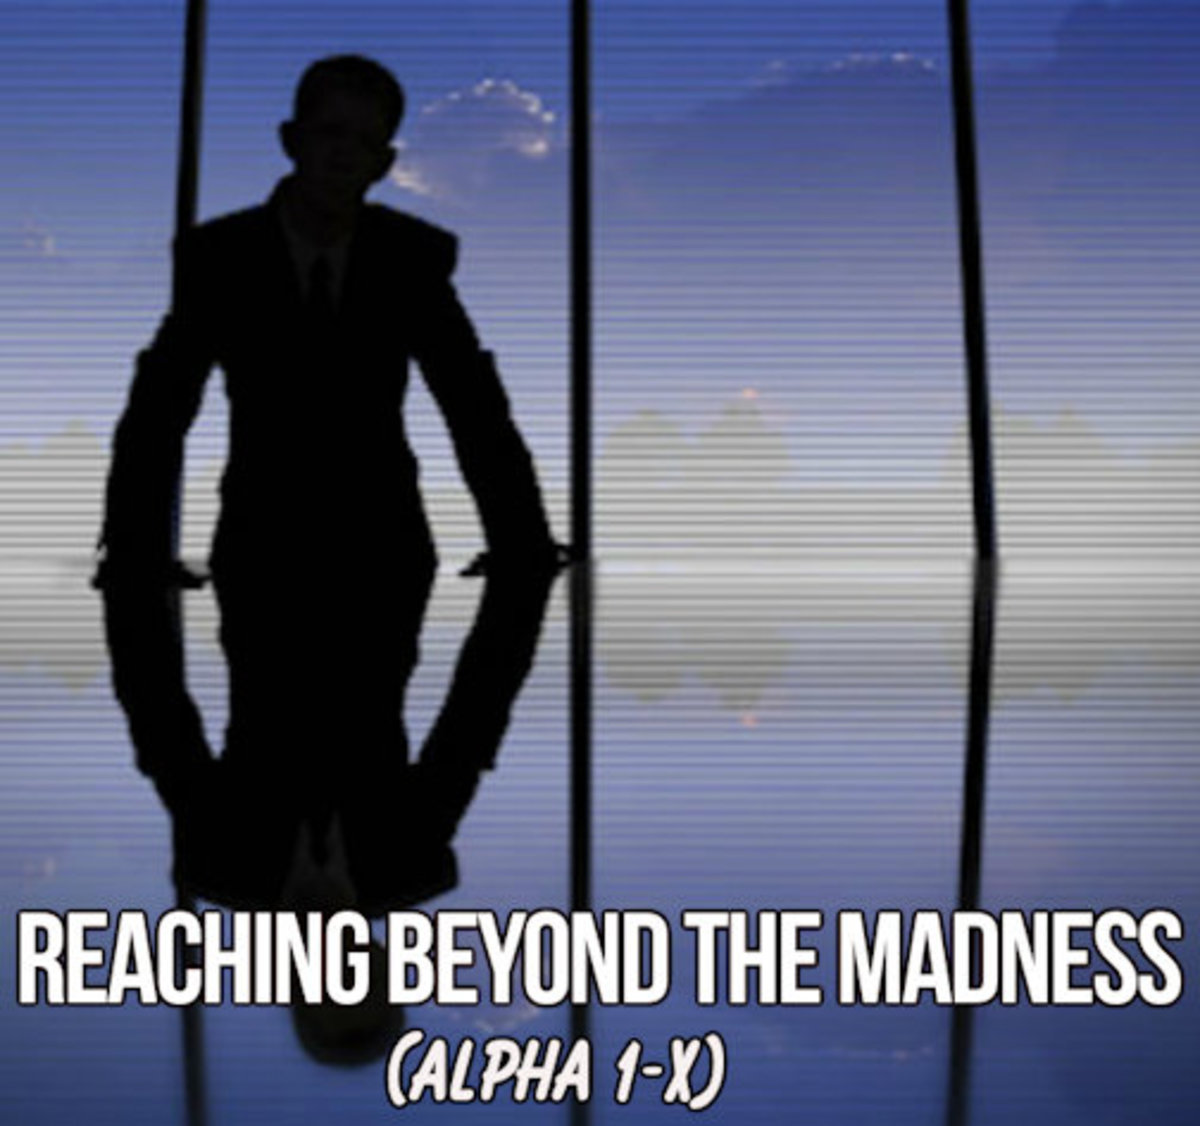 Reaching Beyond the Madness: Schlussfolgerung